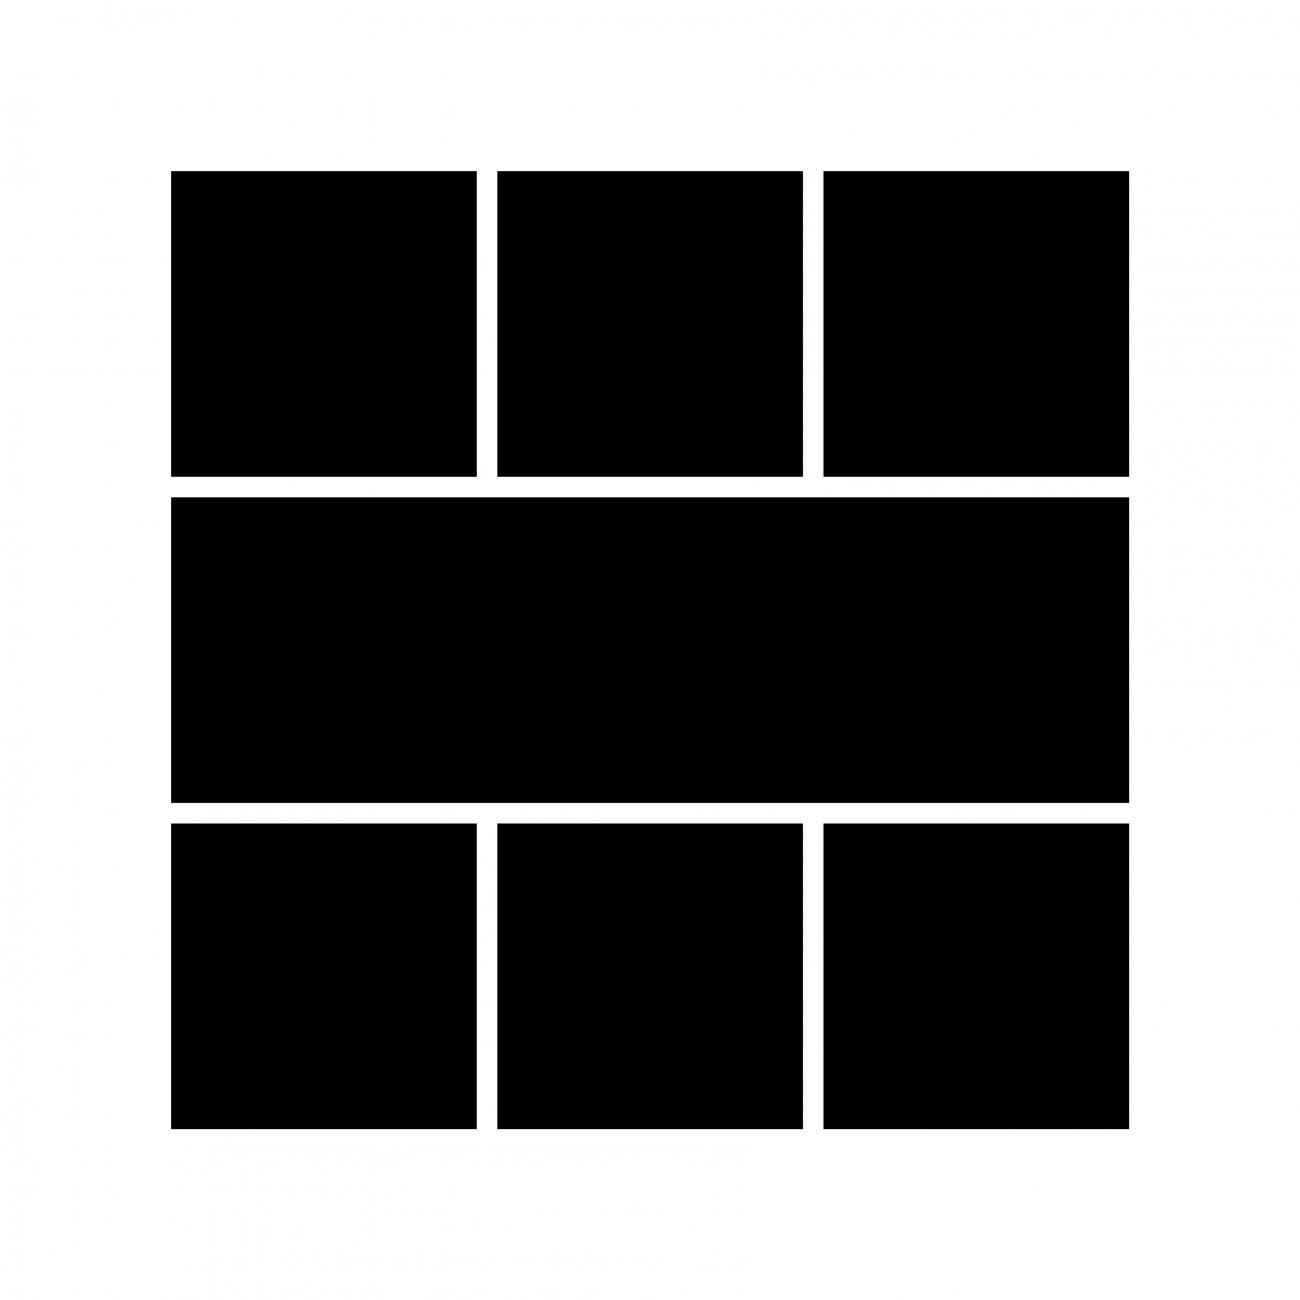 Kvadratisk 02 - 7 bilder